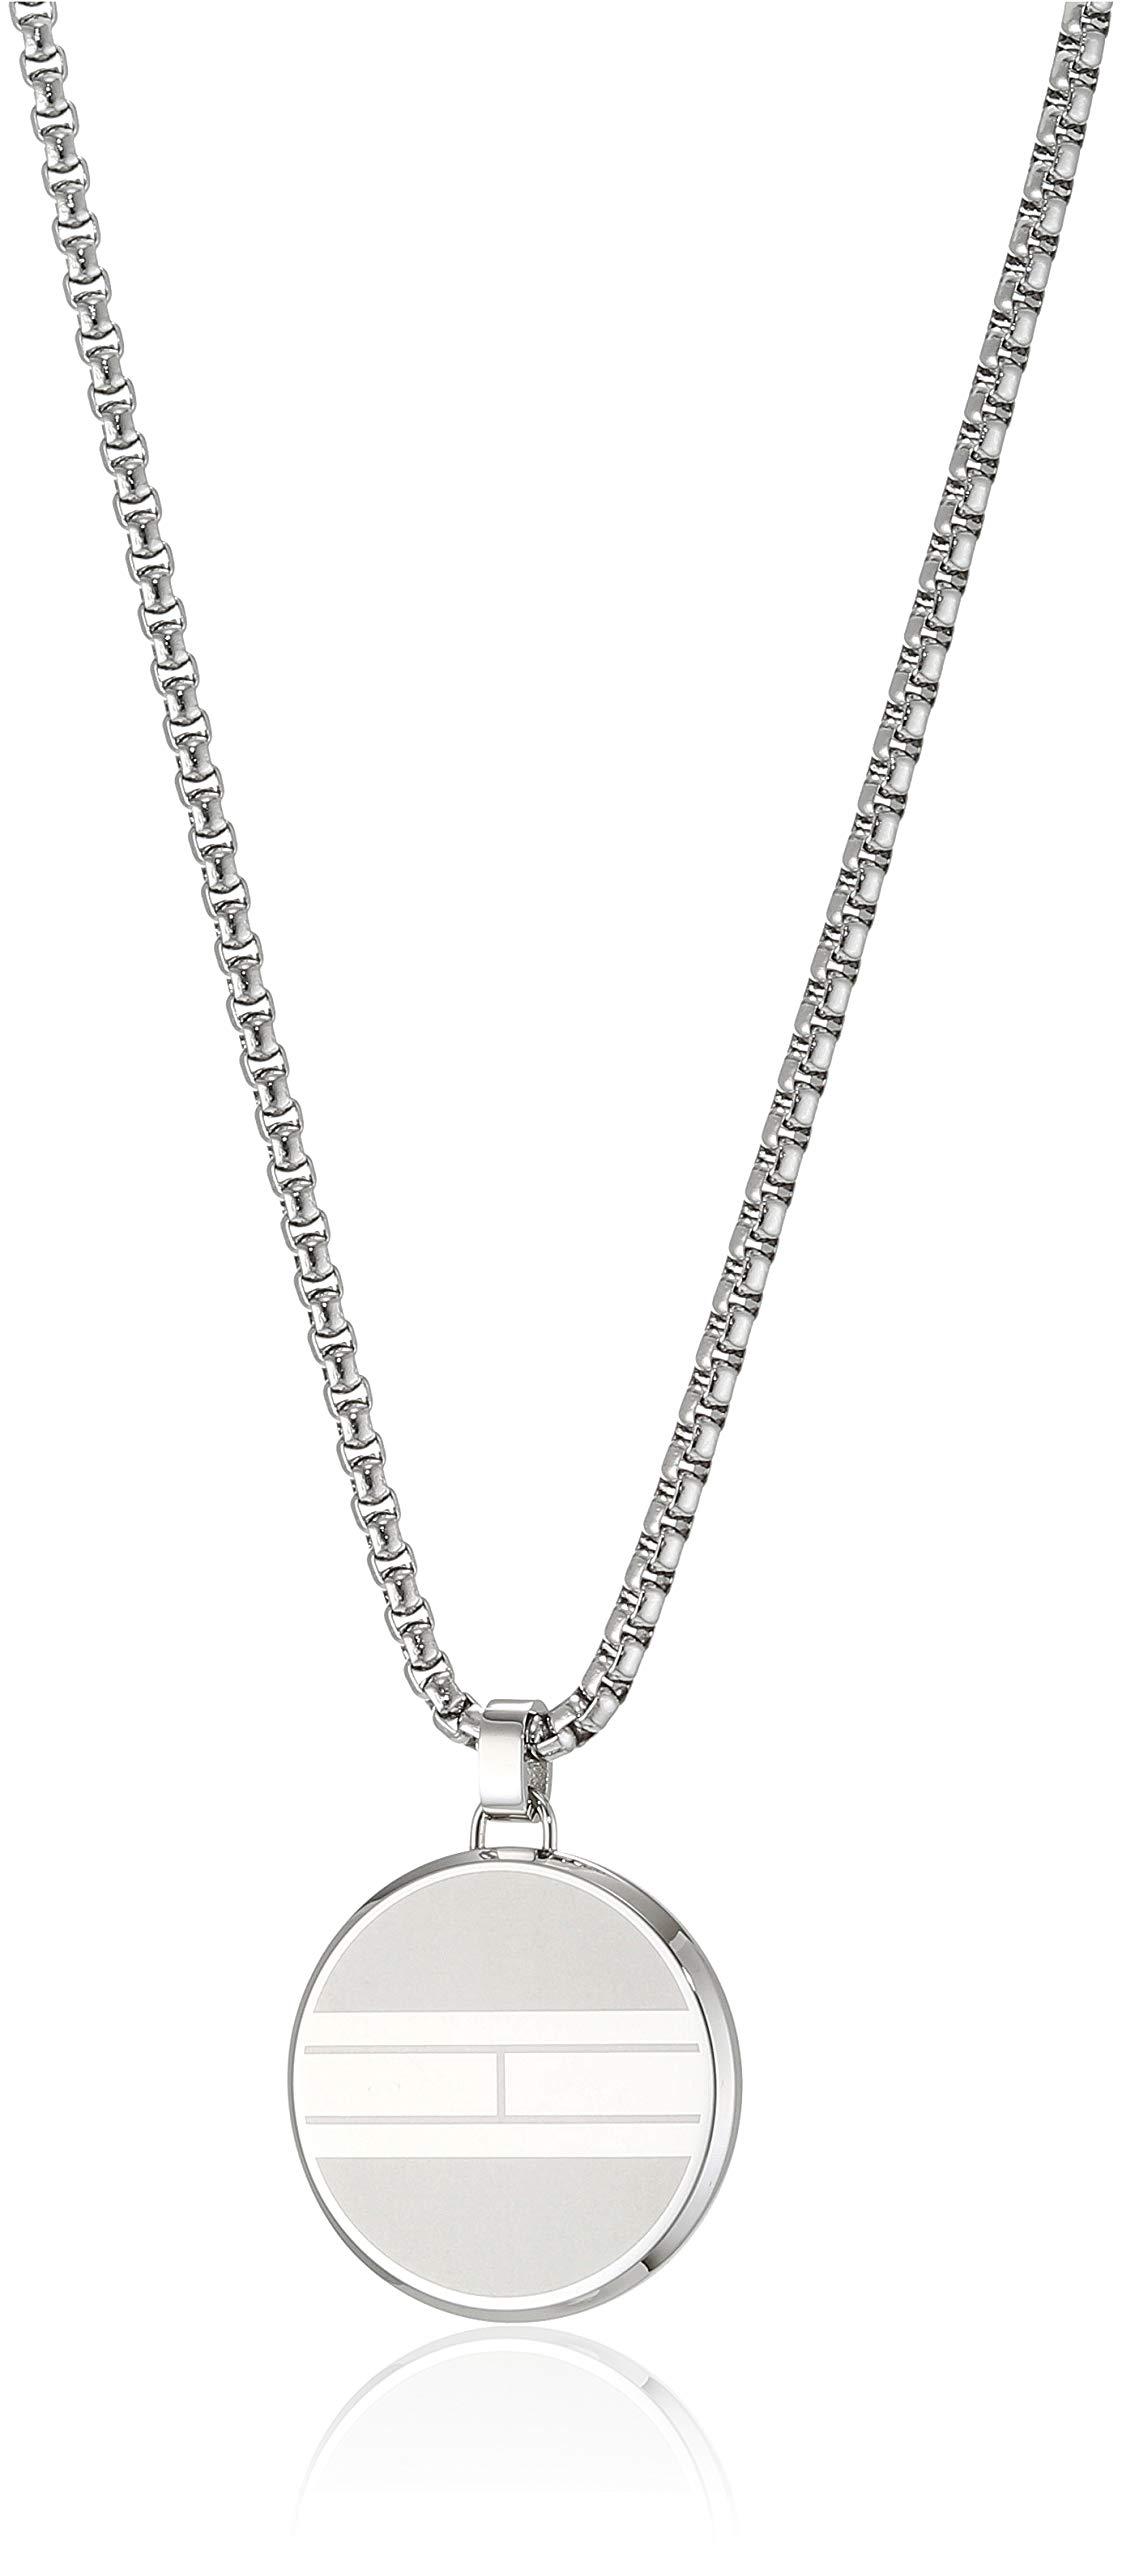 Jewelry Herren Ketten mit Anhänger & Edelstahl - 2790037